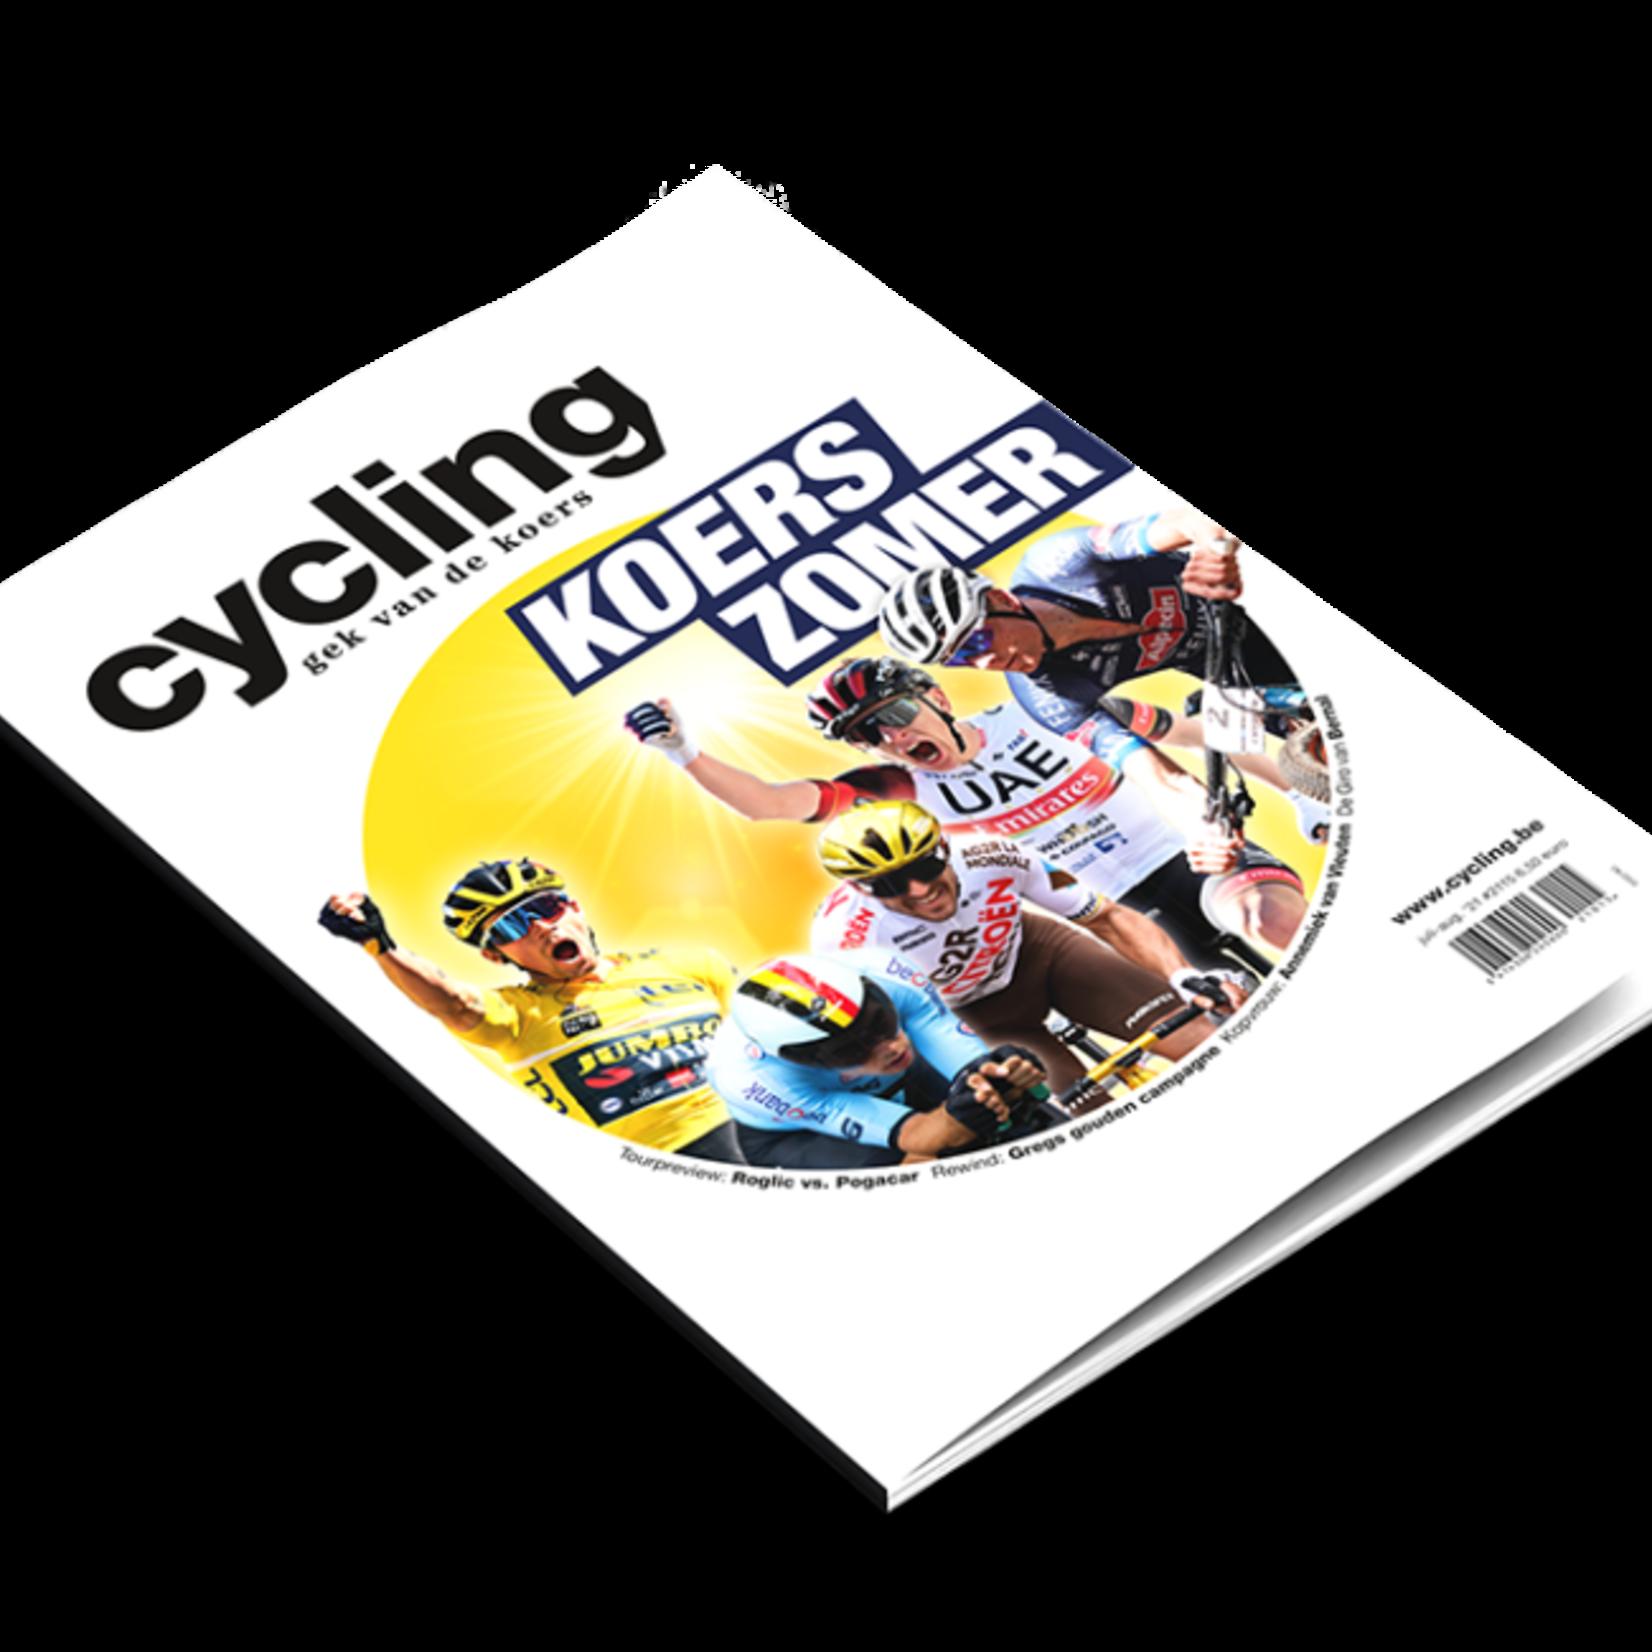 Cycling 'Gek van de koers'